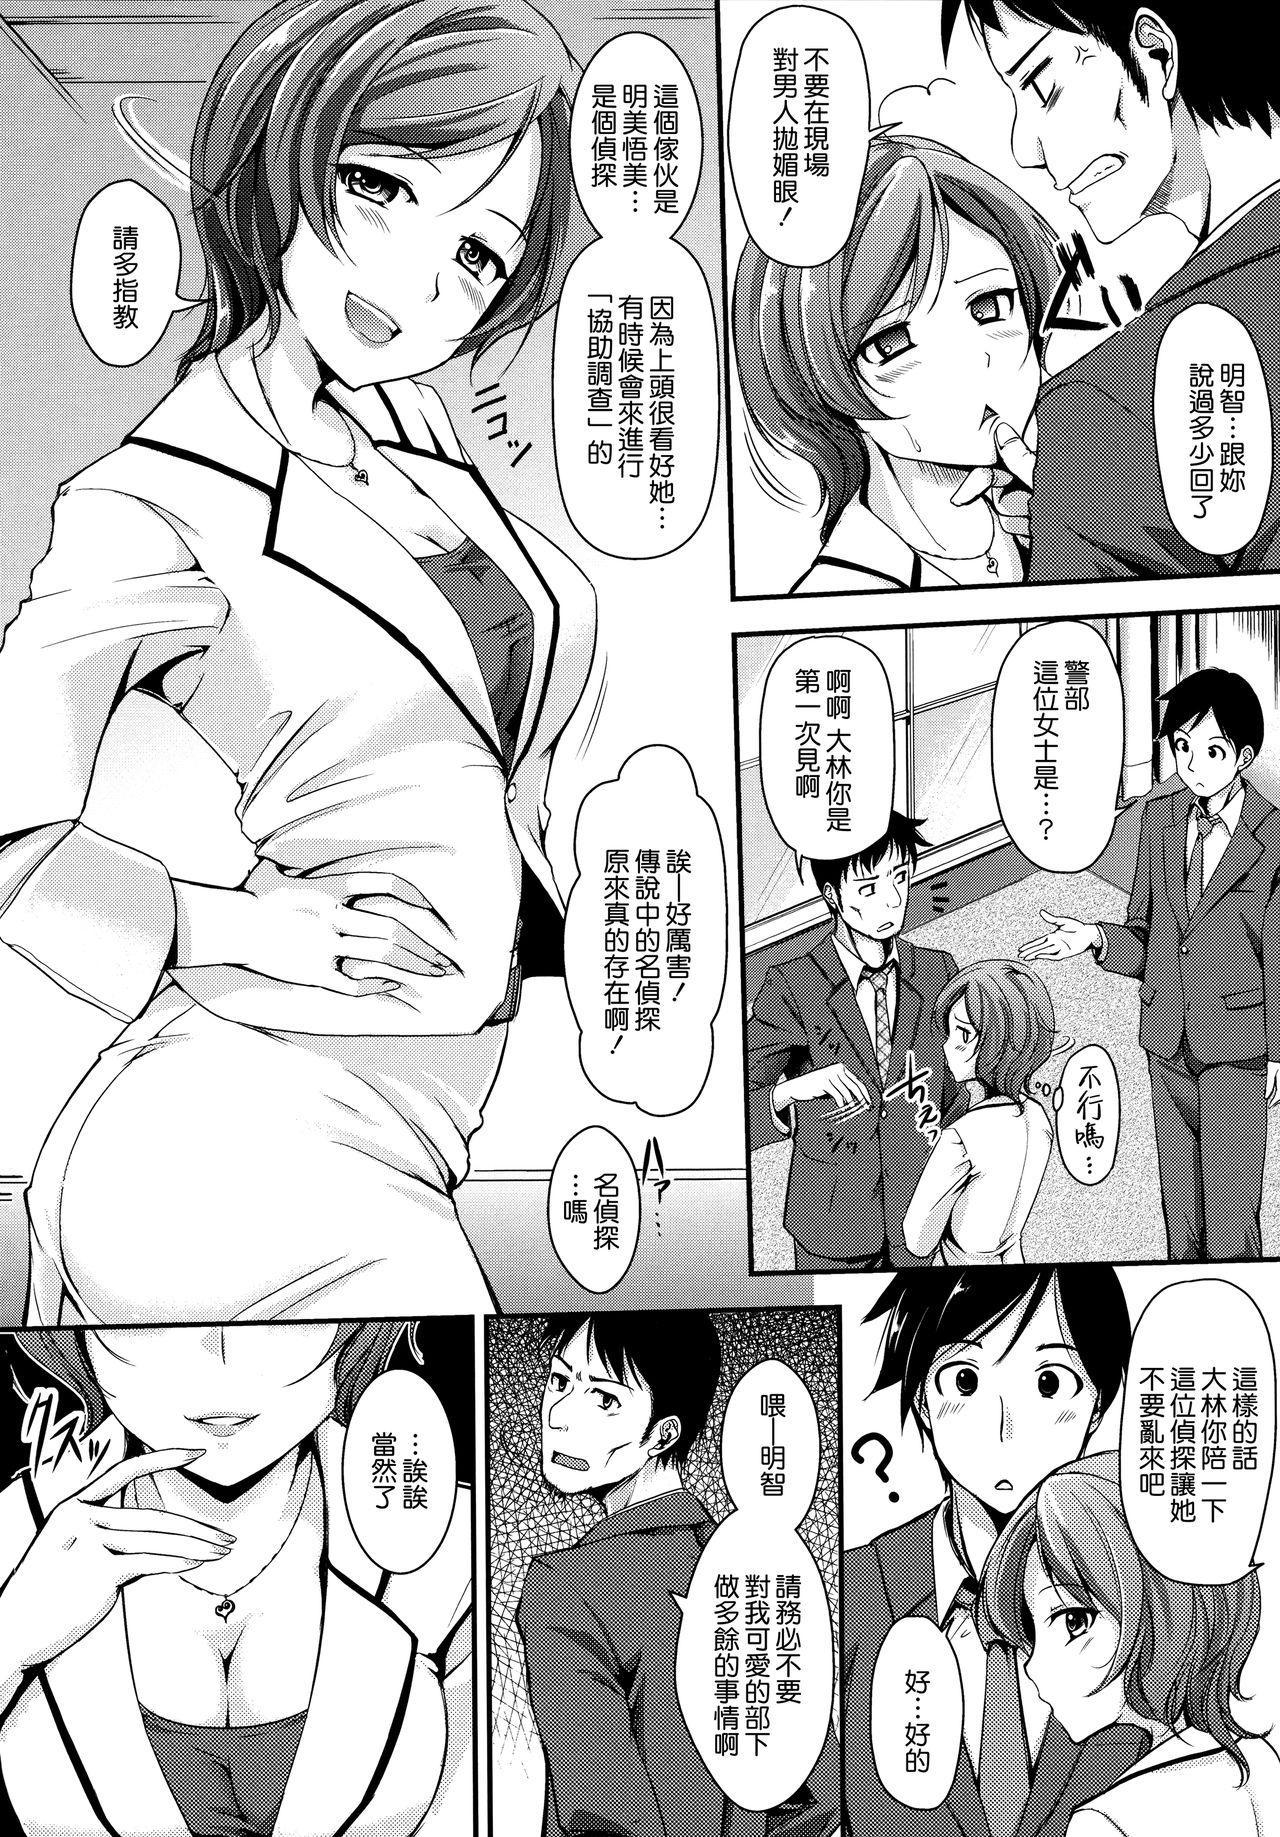 Kimagure Hanabira + Toranoana Leaflet 104